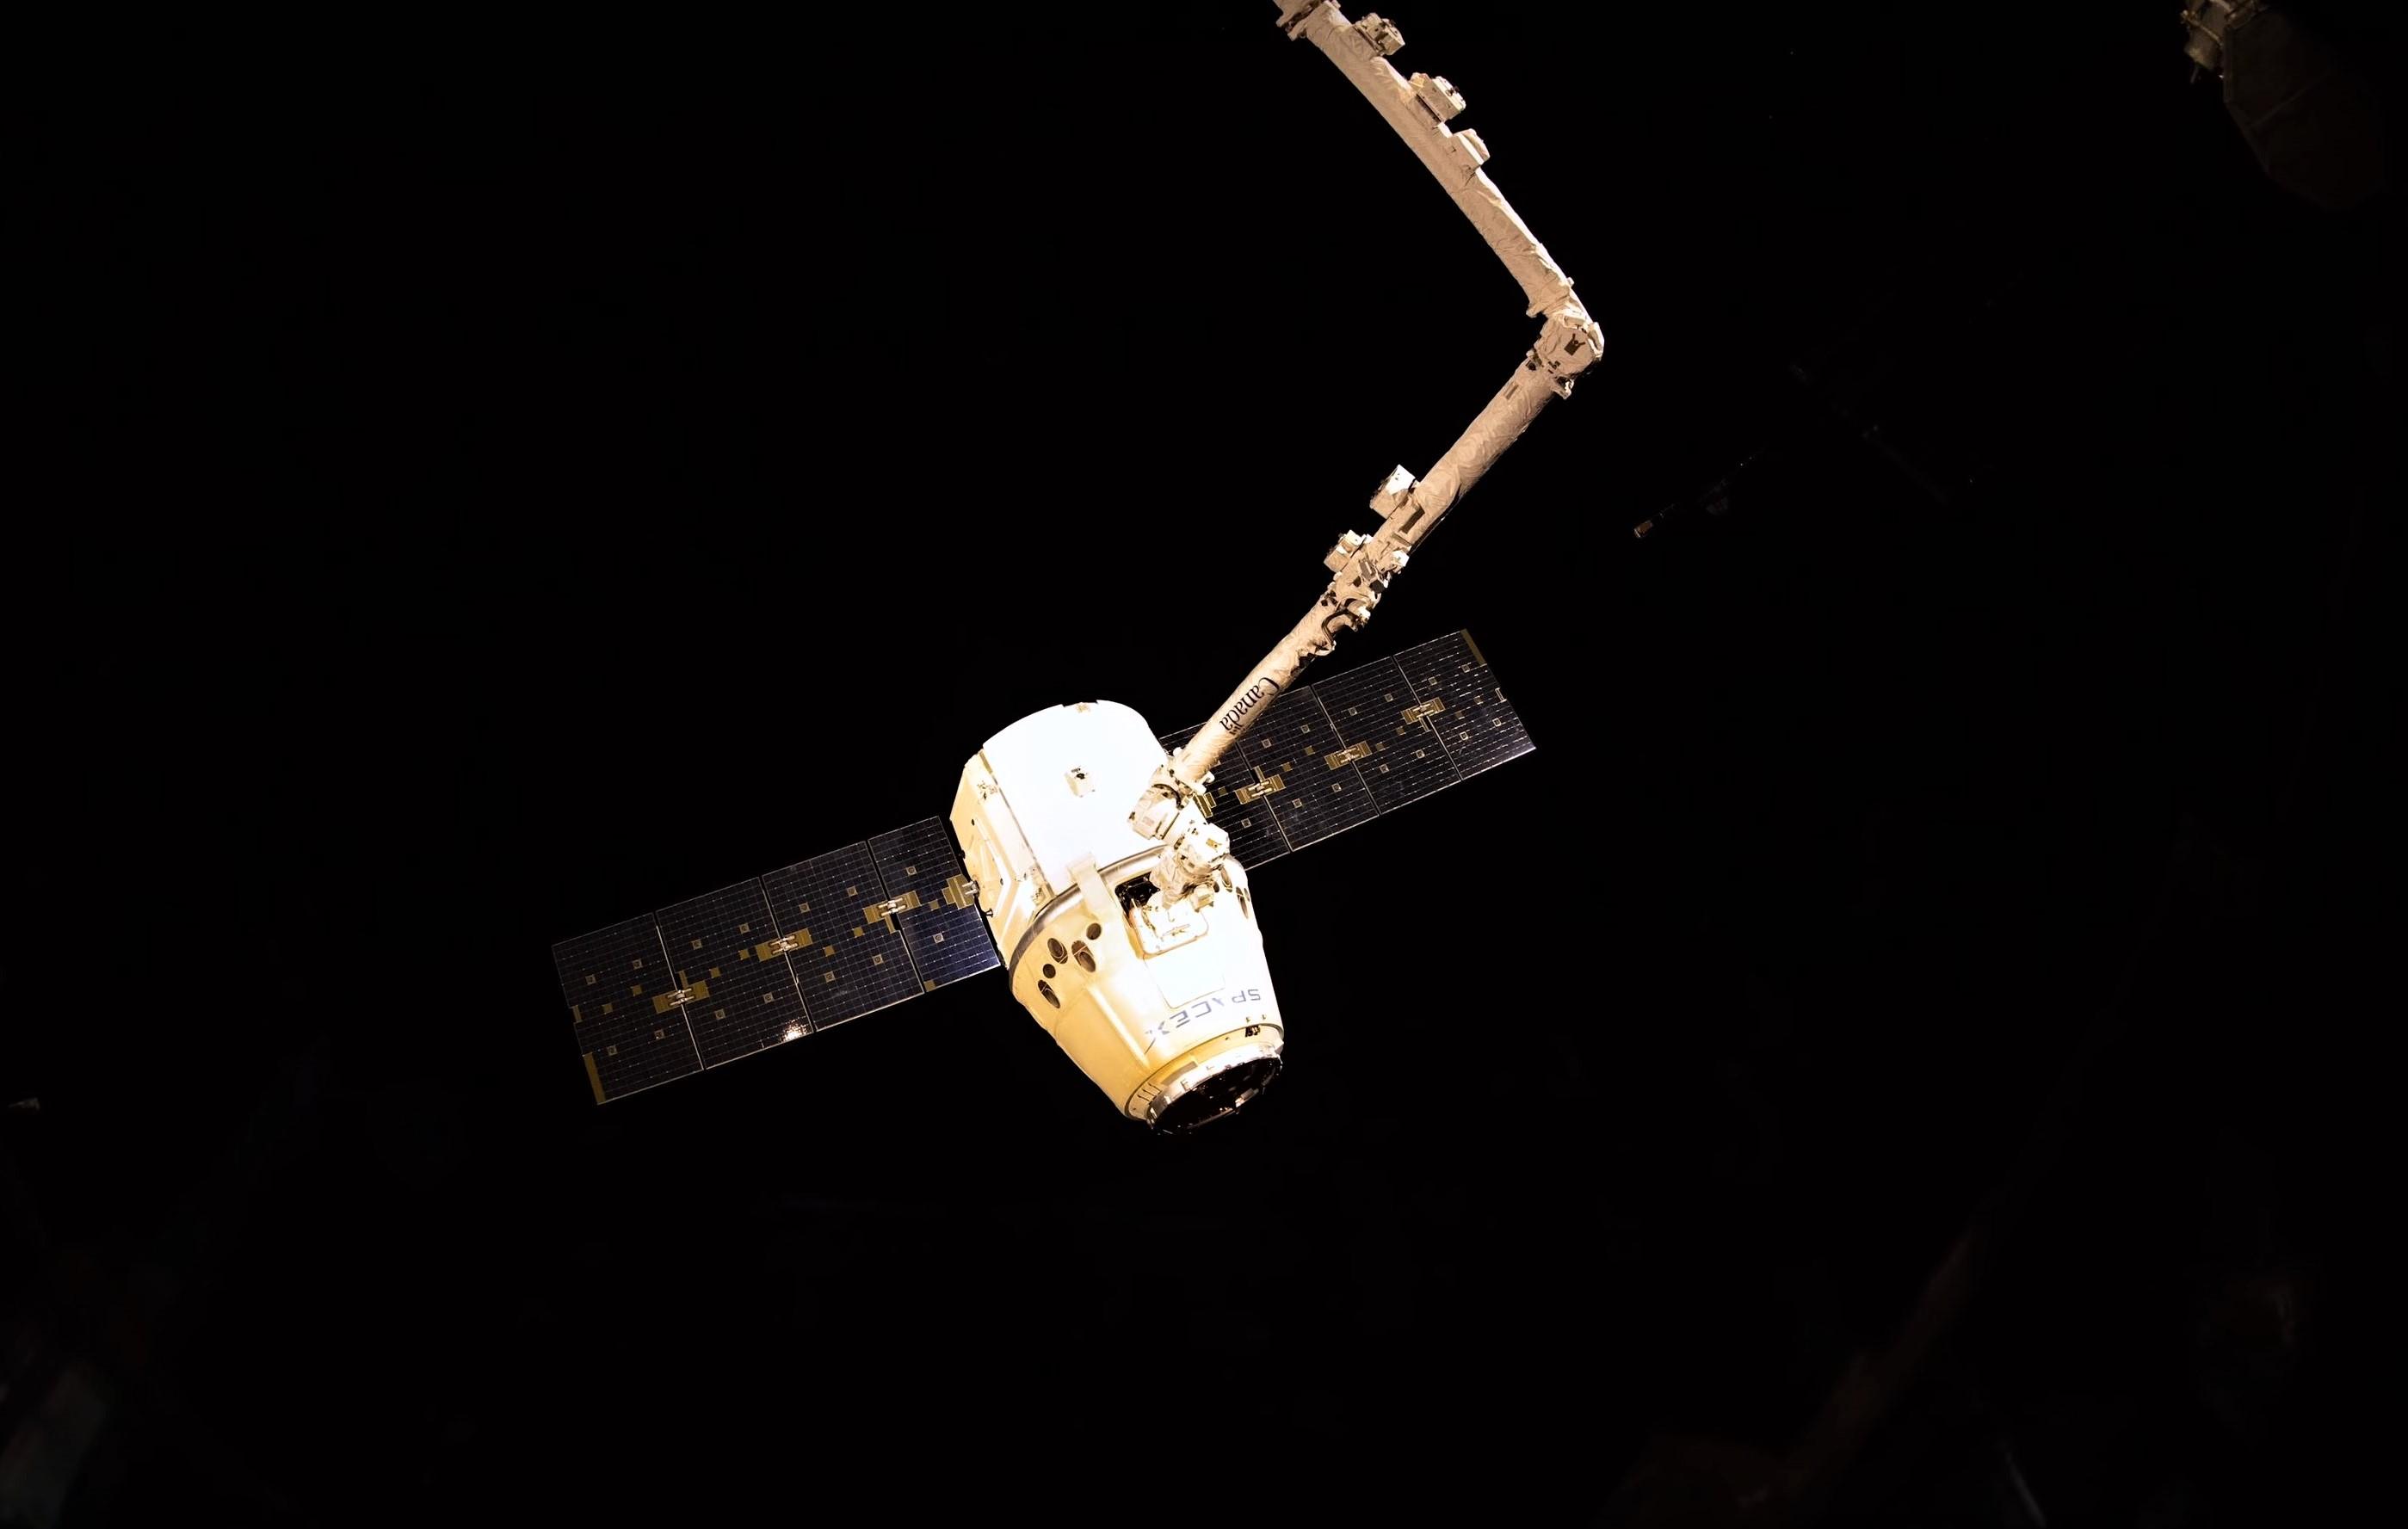 CRS-15 departure 4K (ESA) 8